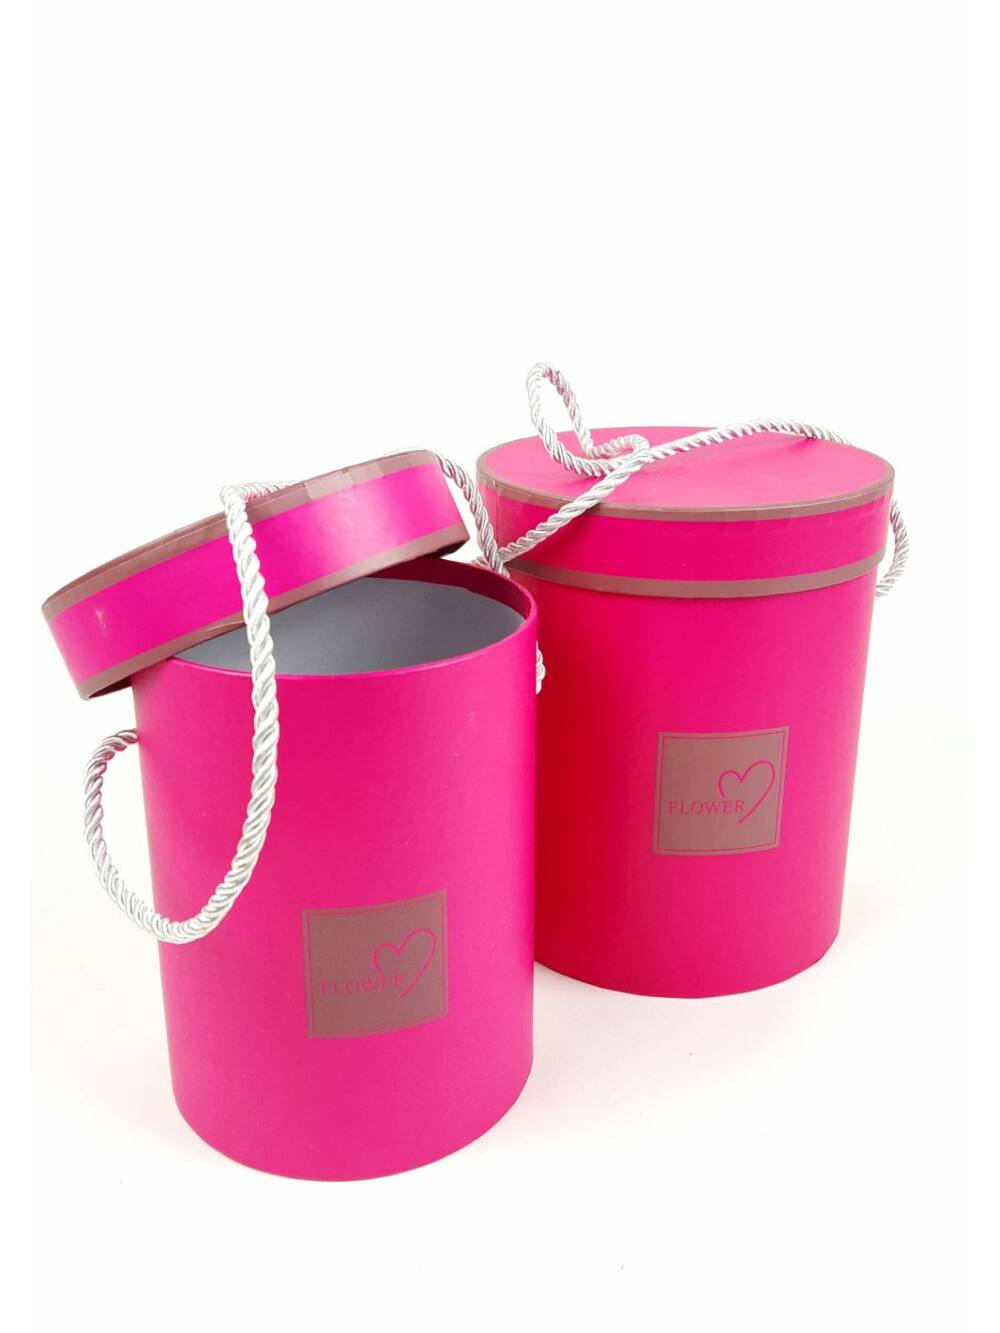 Virág doboz henger szett - Pink